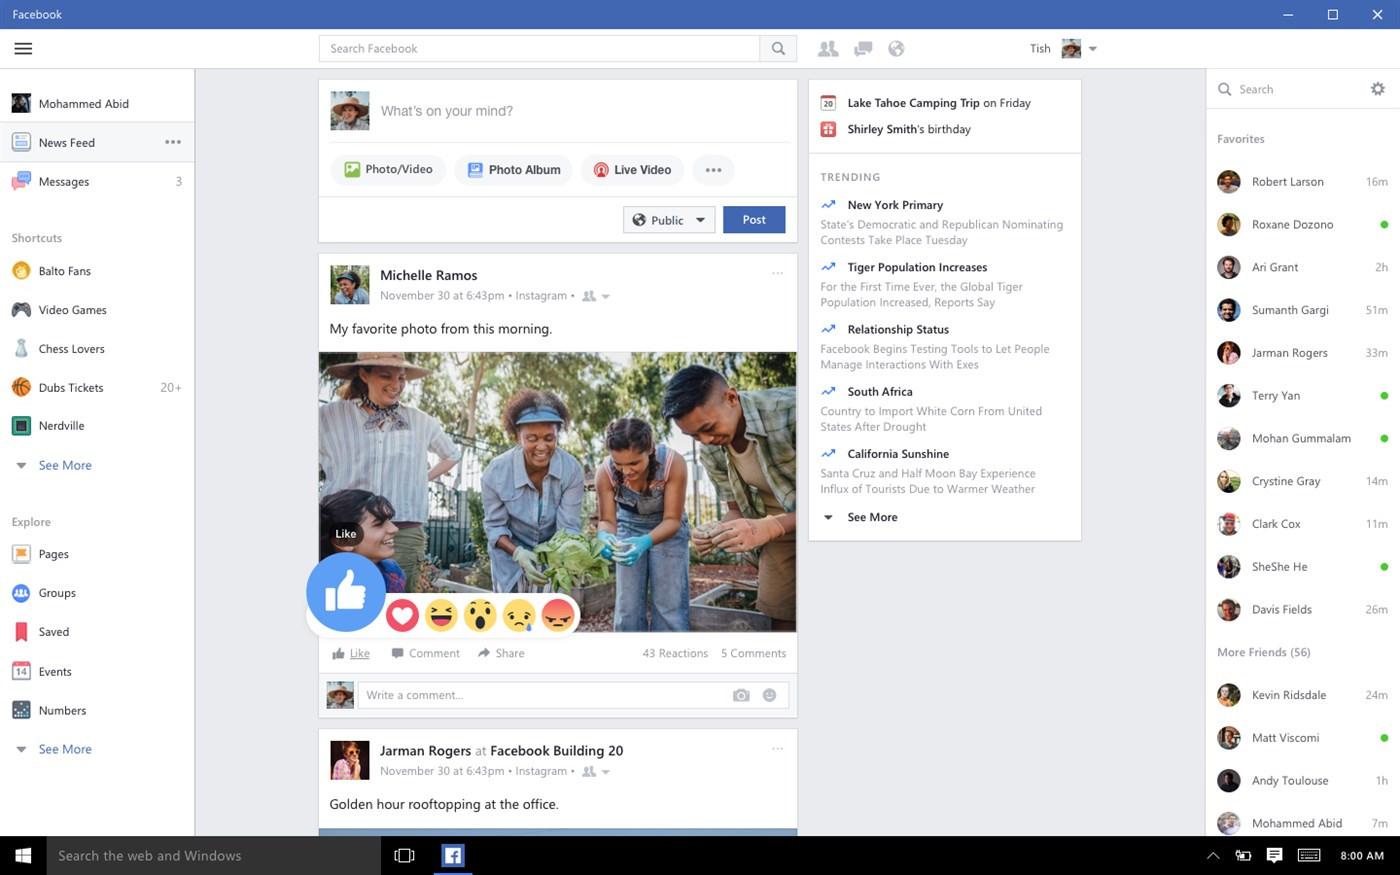 Facebook dla Windows 10 Messenger koniec wsparcia